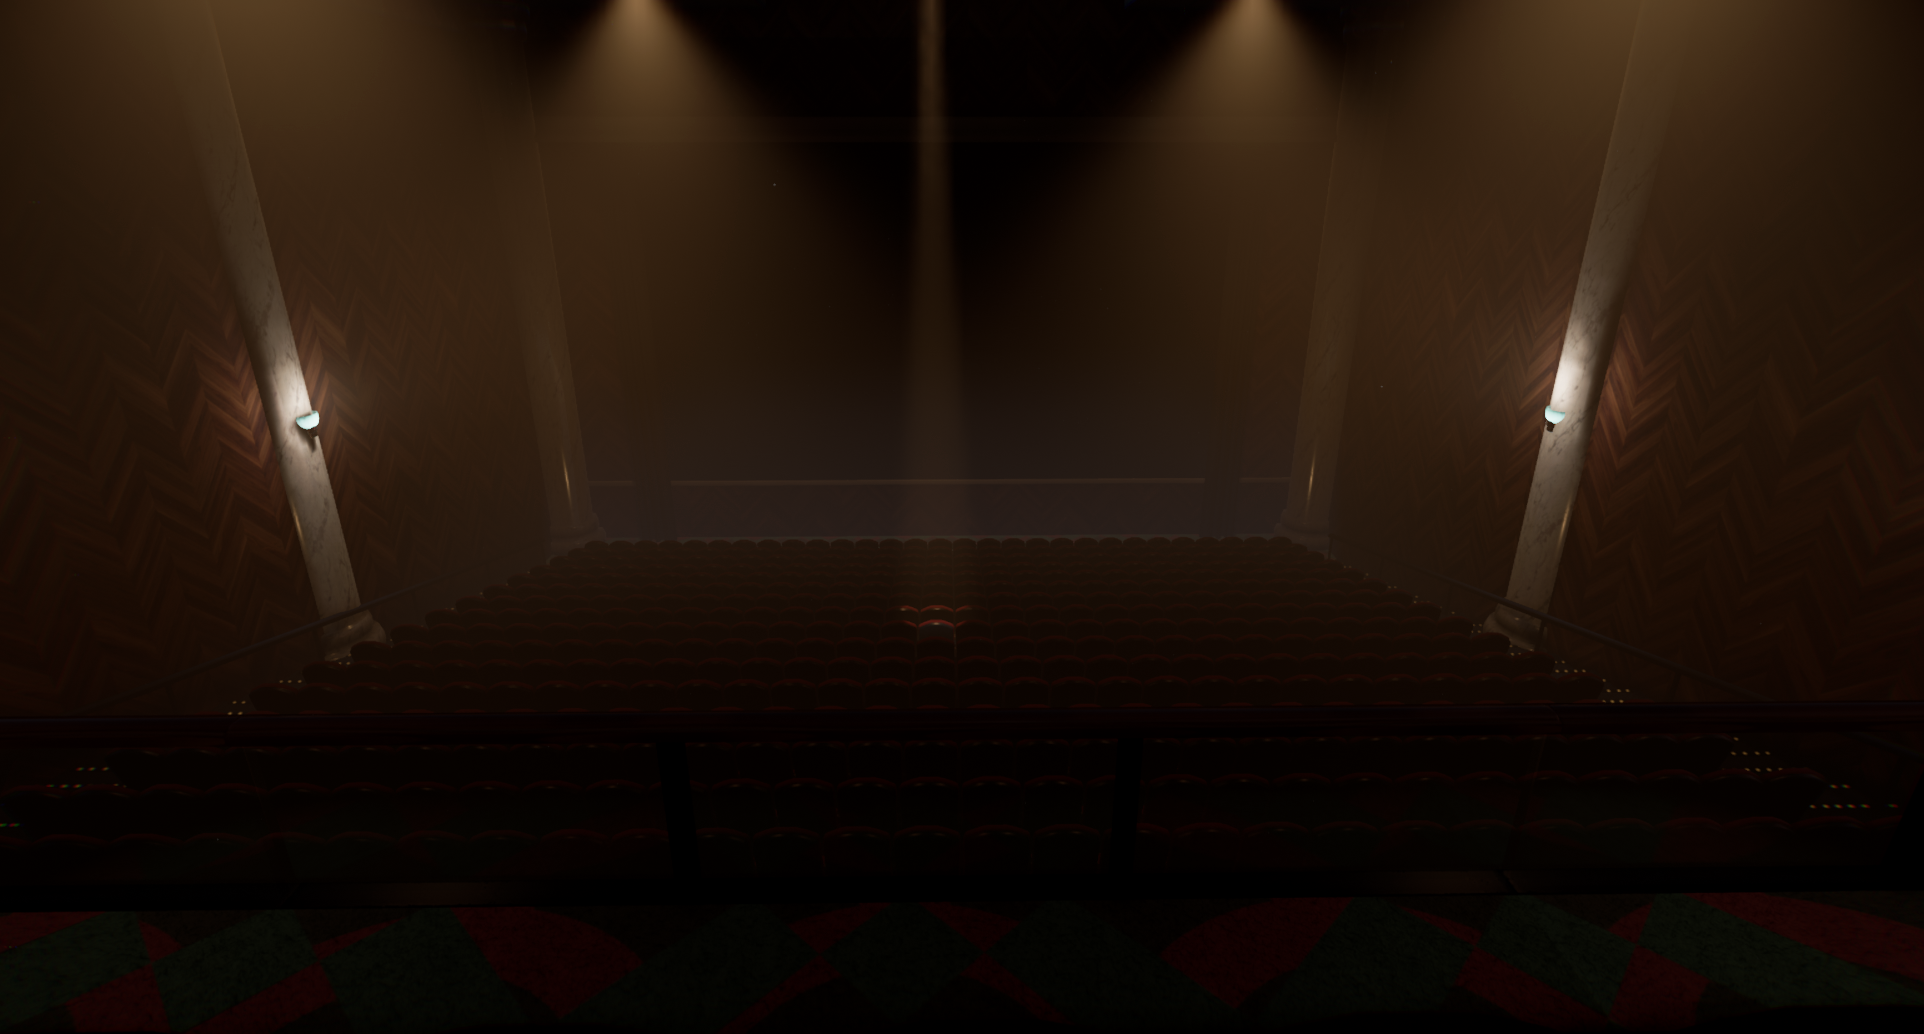 Movie theater with spotlight